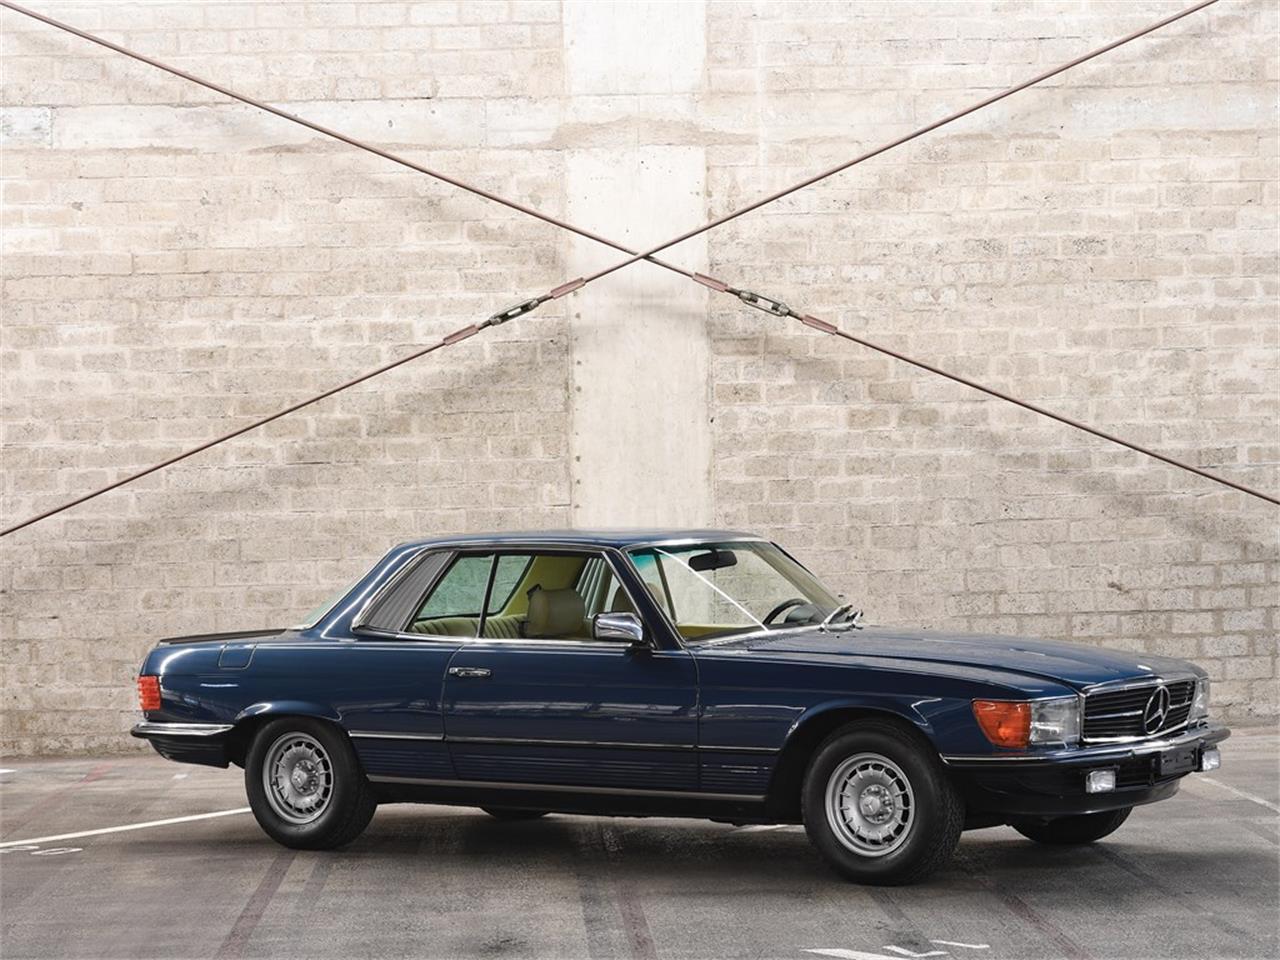 1980 Mercedes-Benz 450 SLC 50 for Sale   ClassicCars.com   CC-1182617